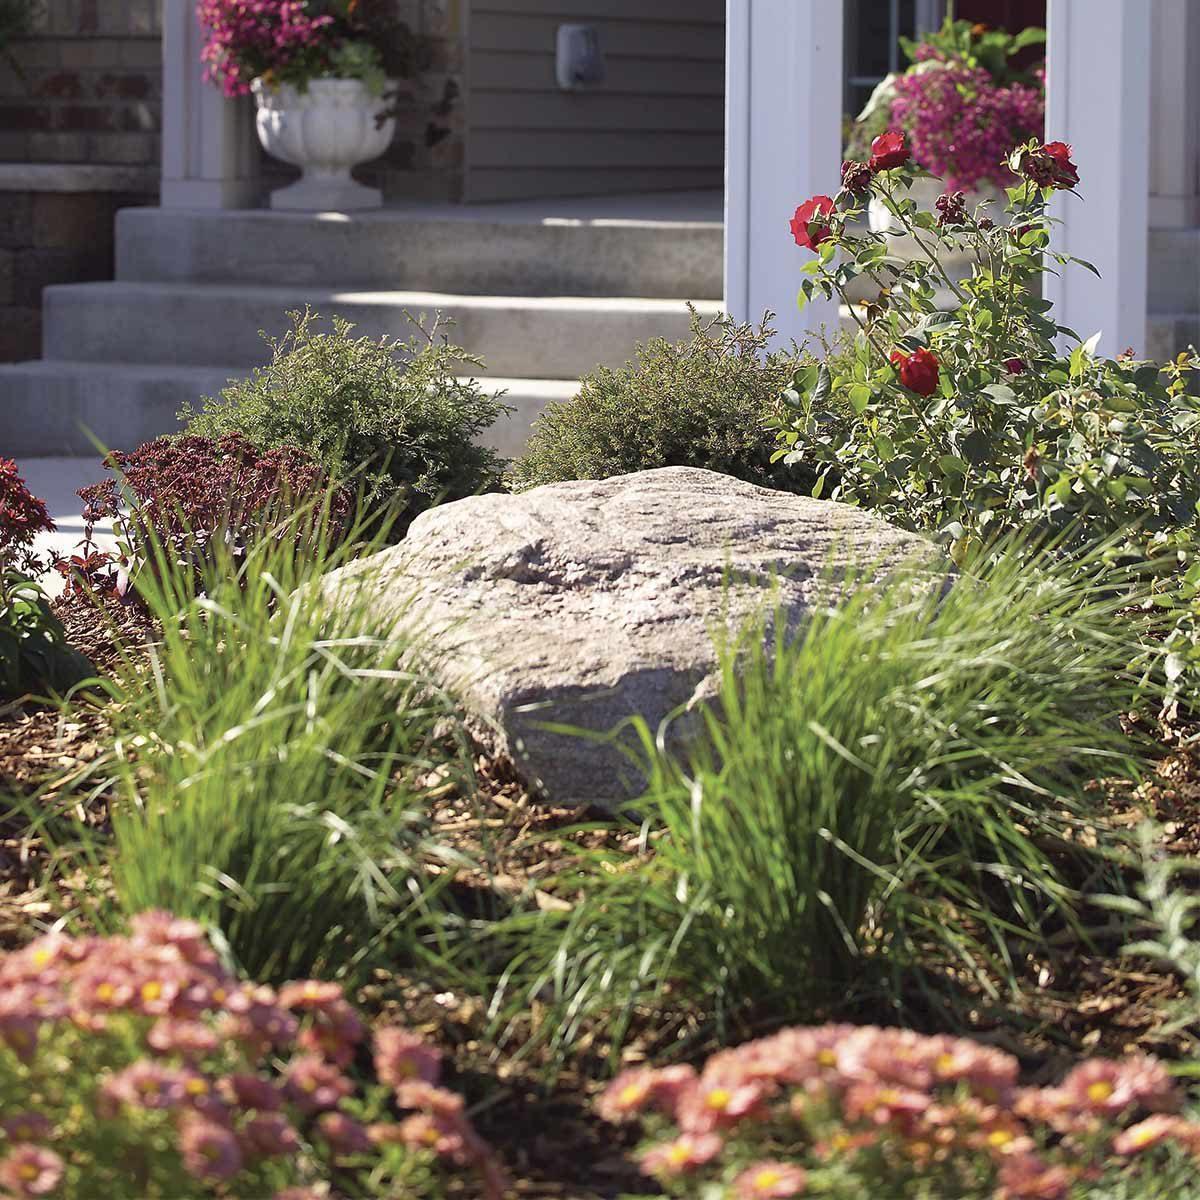 landscaping boulder & Cheap Landscaping Updates that Make a Splash \u2014 Family Handyman | The ...